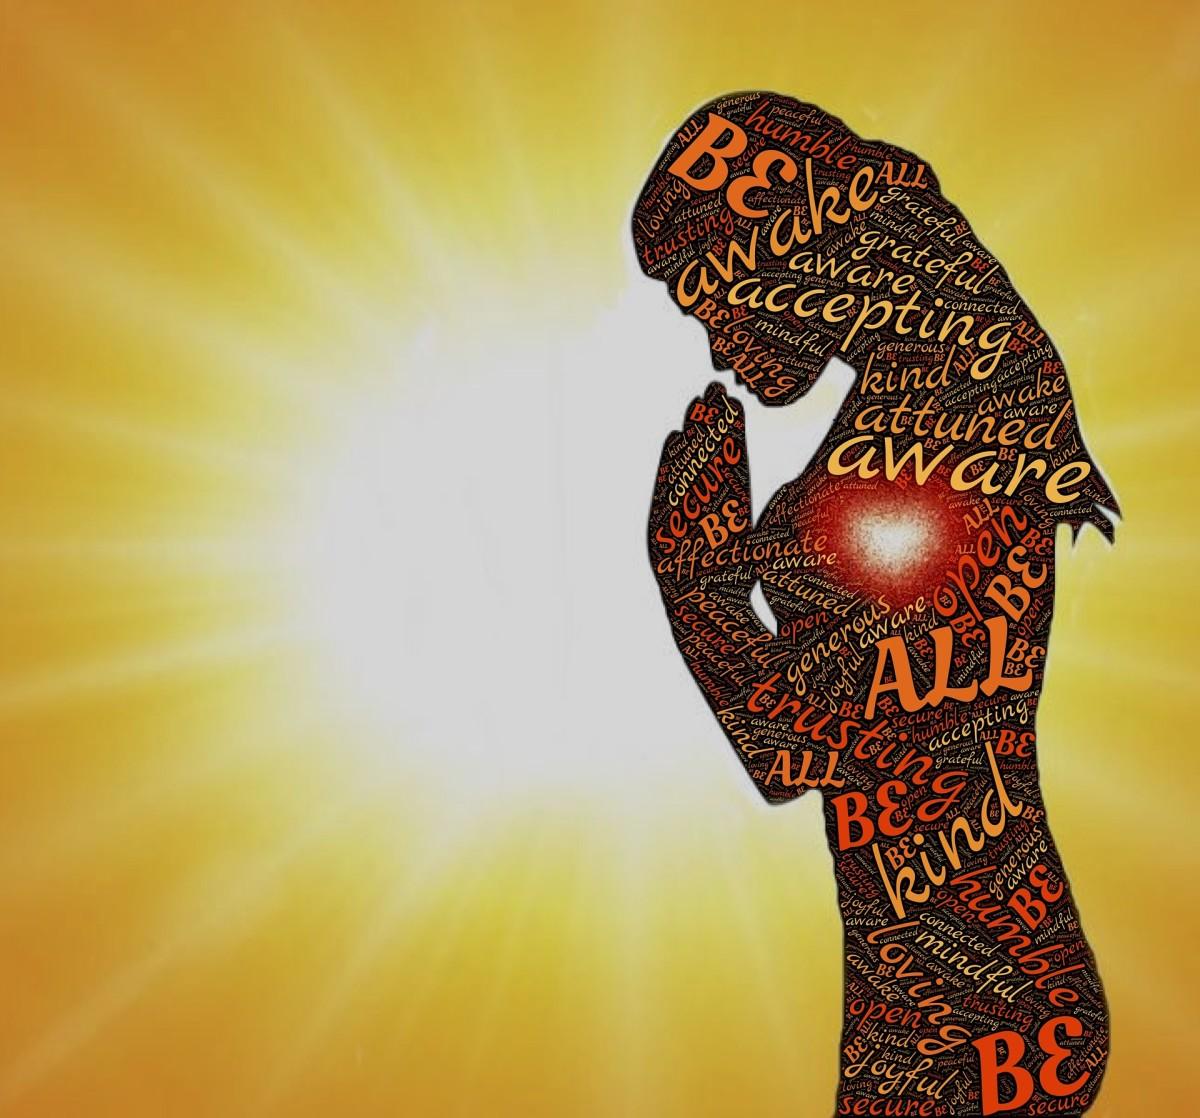 Aware Awake Accepting Attuned Grateful Prayer